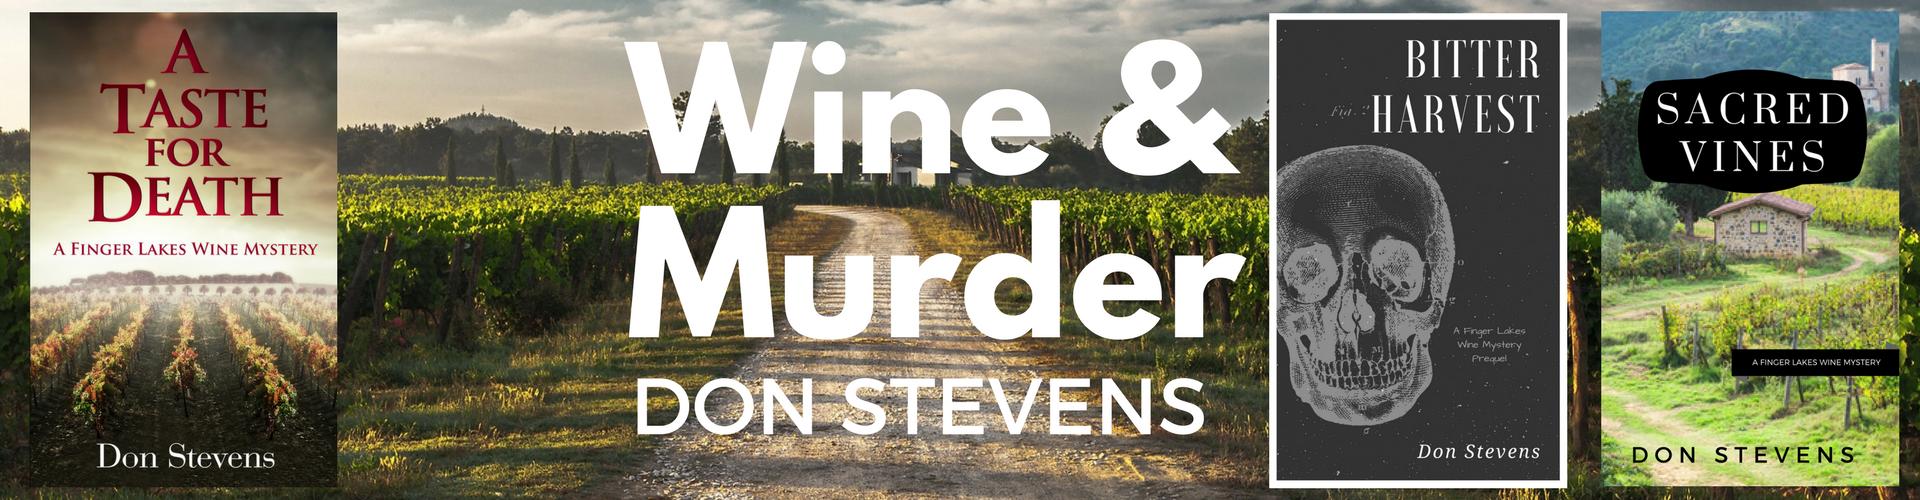 Don Stevens author page